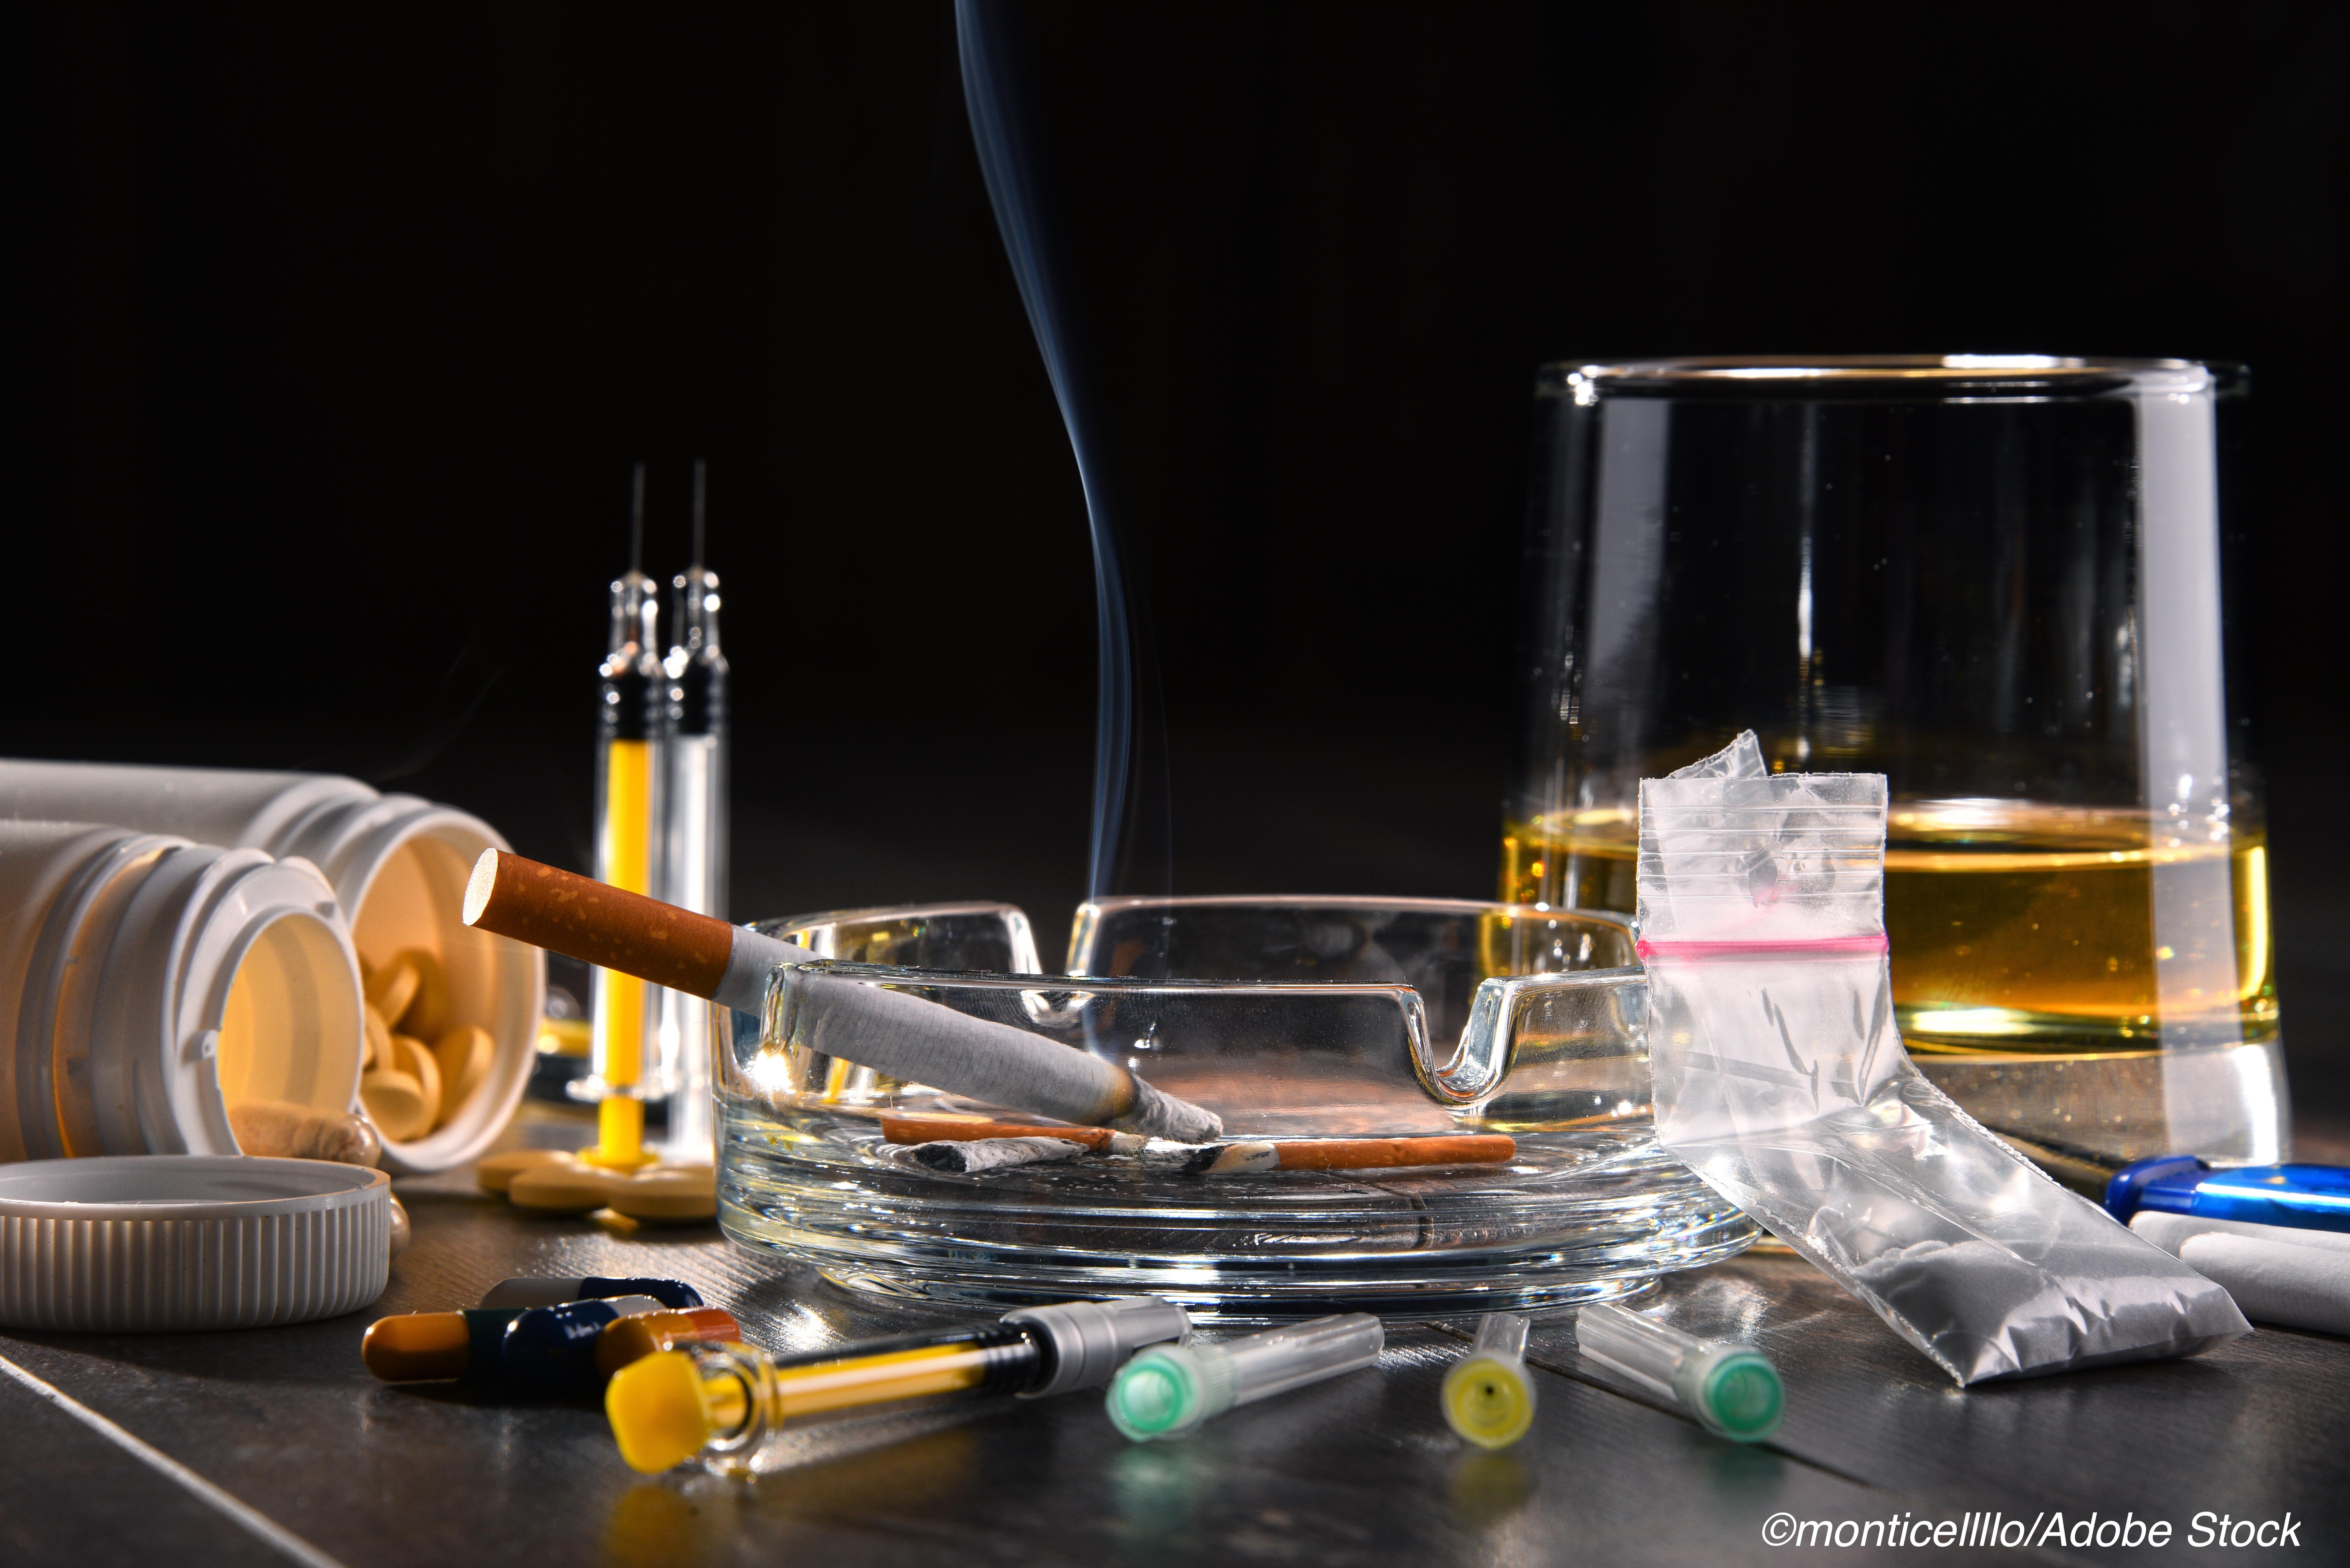 Alcohol, Tobacco, and Illicit Drugs a Major Driver of Premature ASCVD